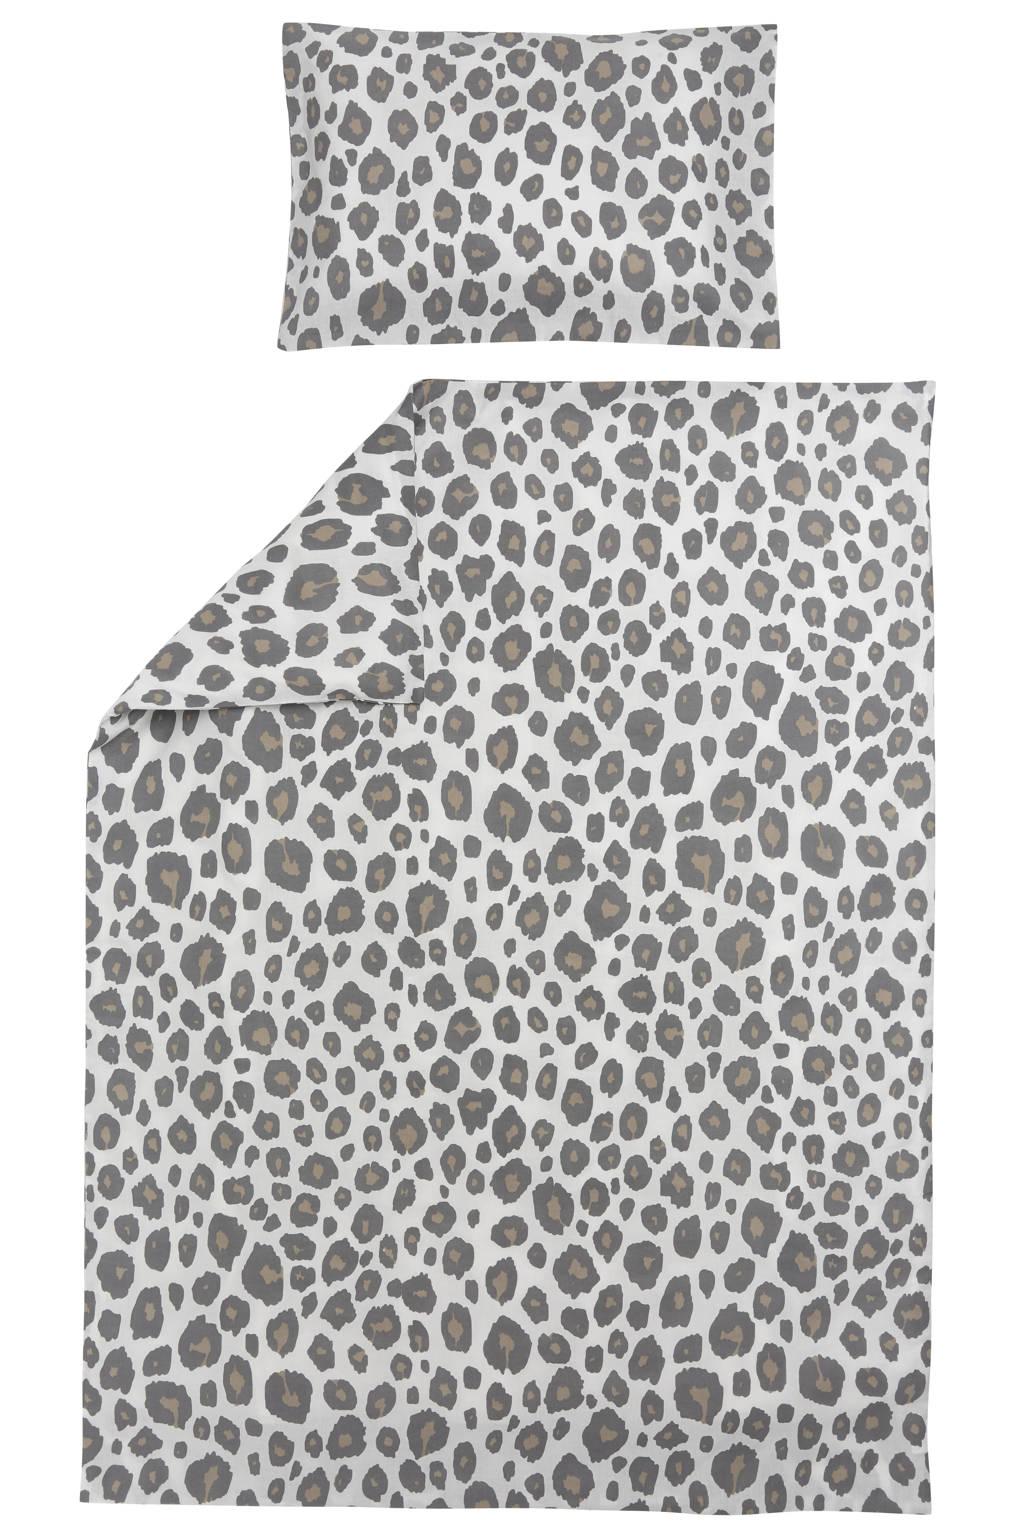 Meyco ledikant dekbedovertrek + kussensloop 100x135 cm Panter neutral, Panterprint